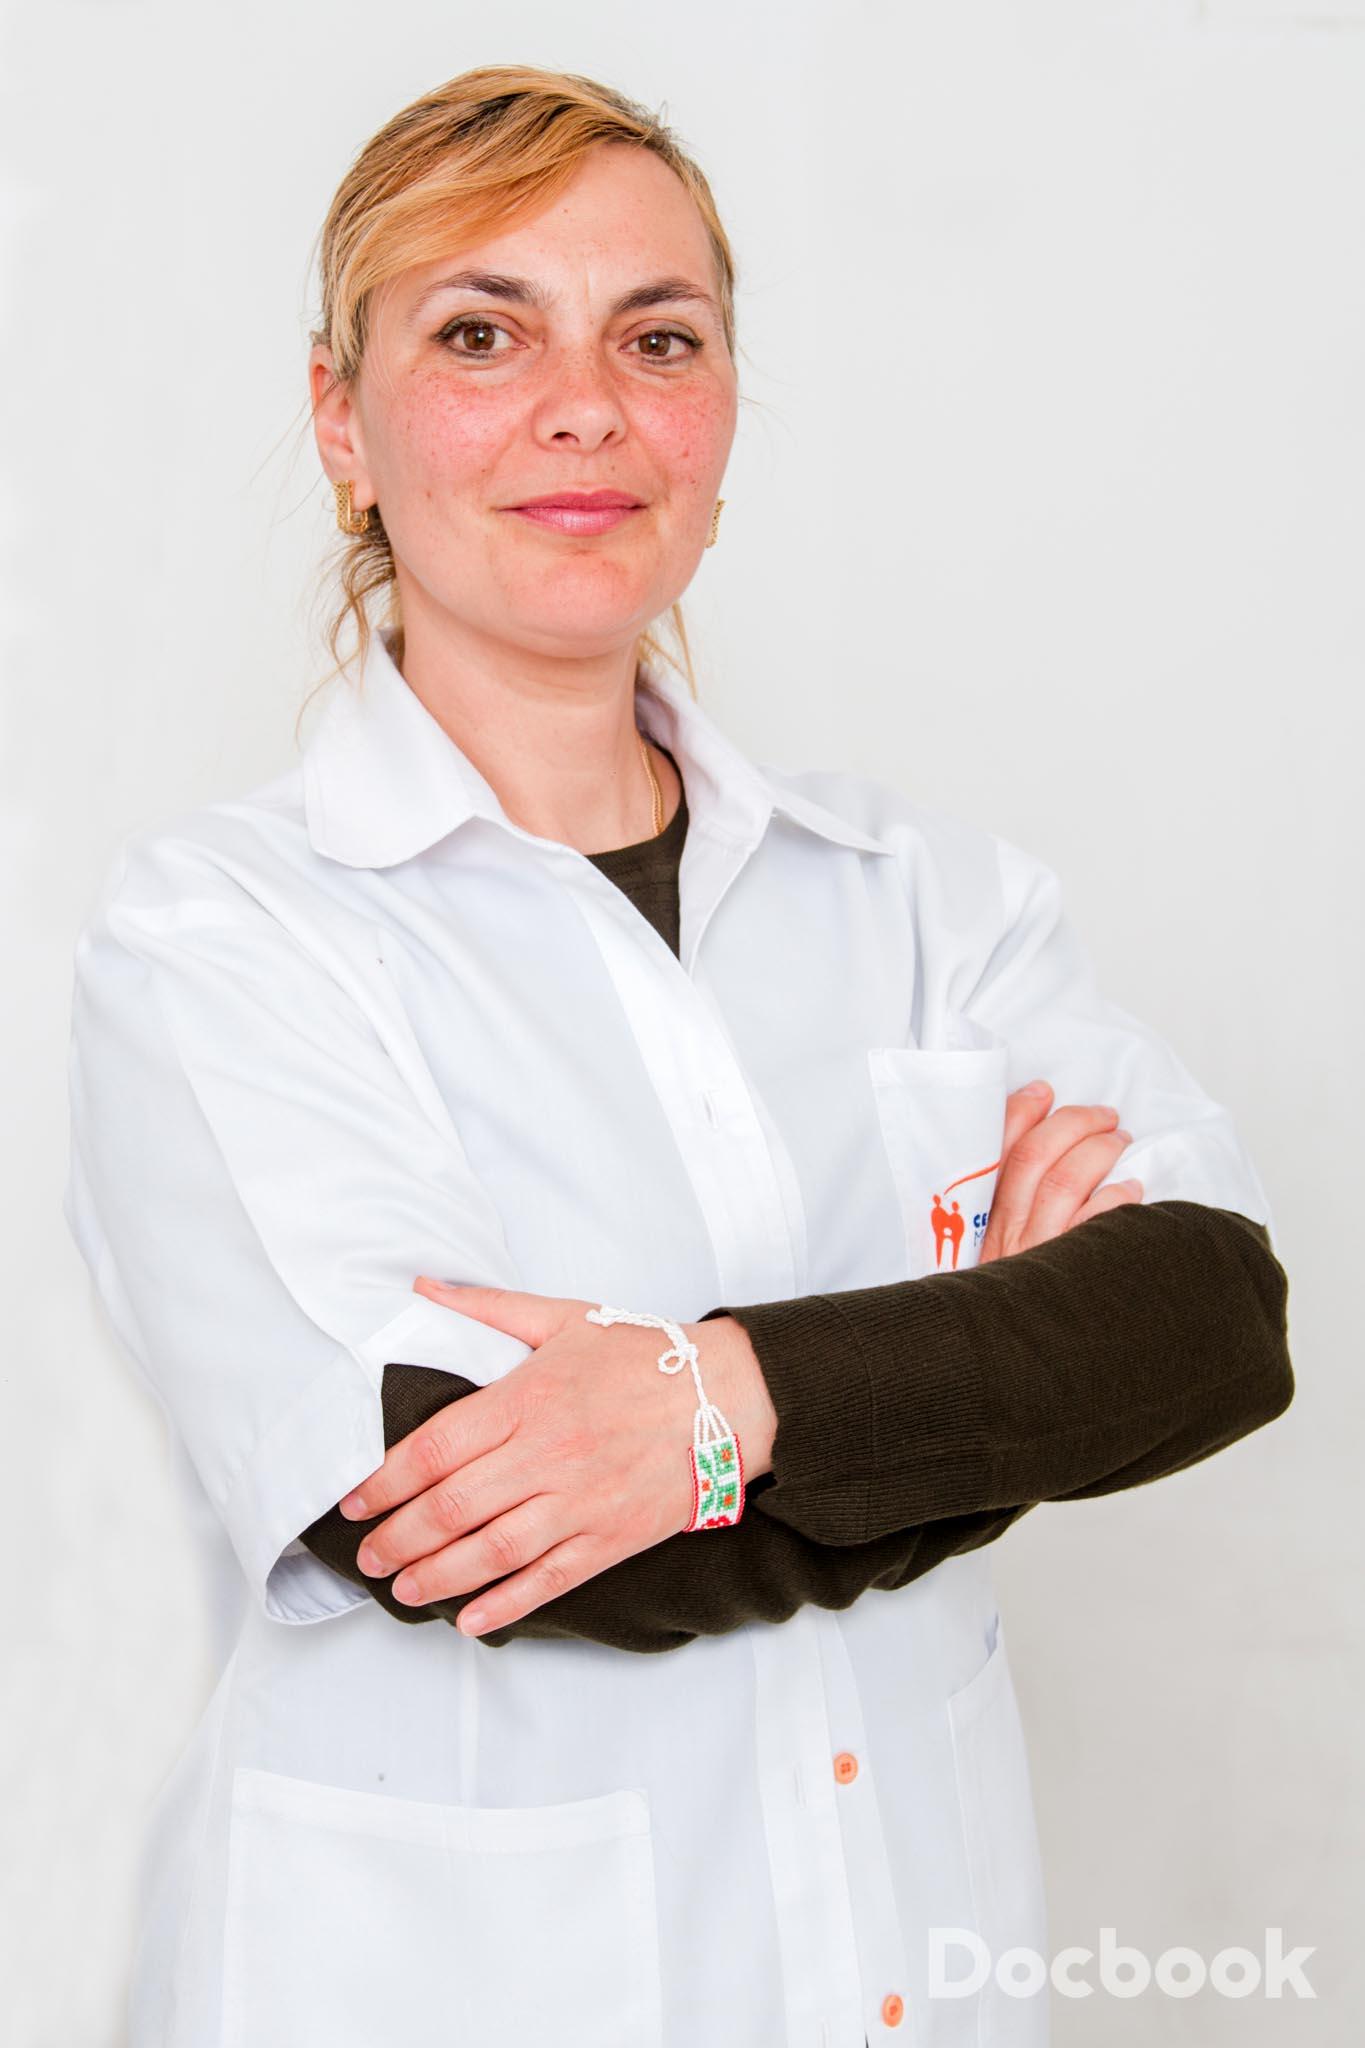 Dr. Mihaela Lungu